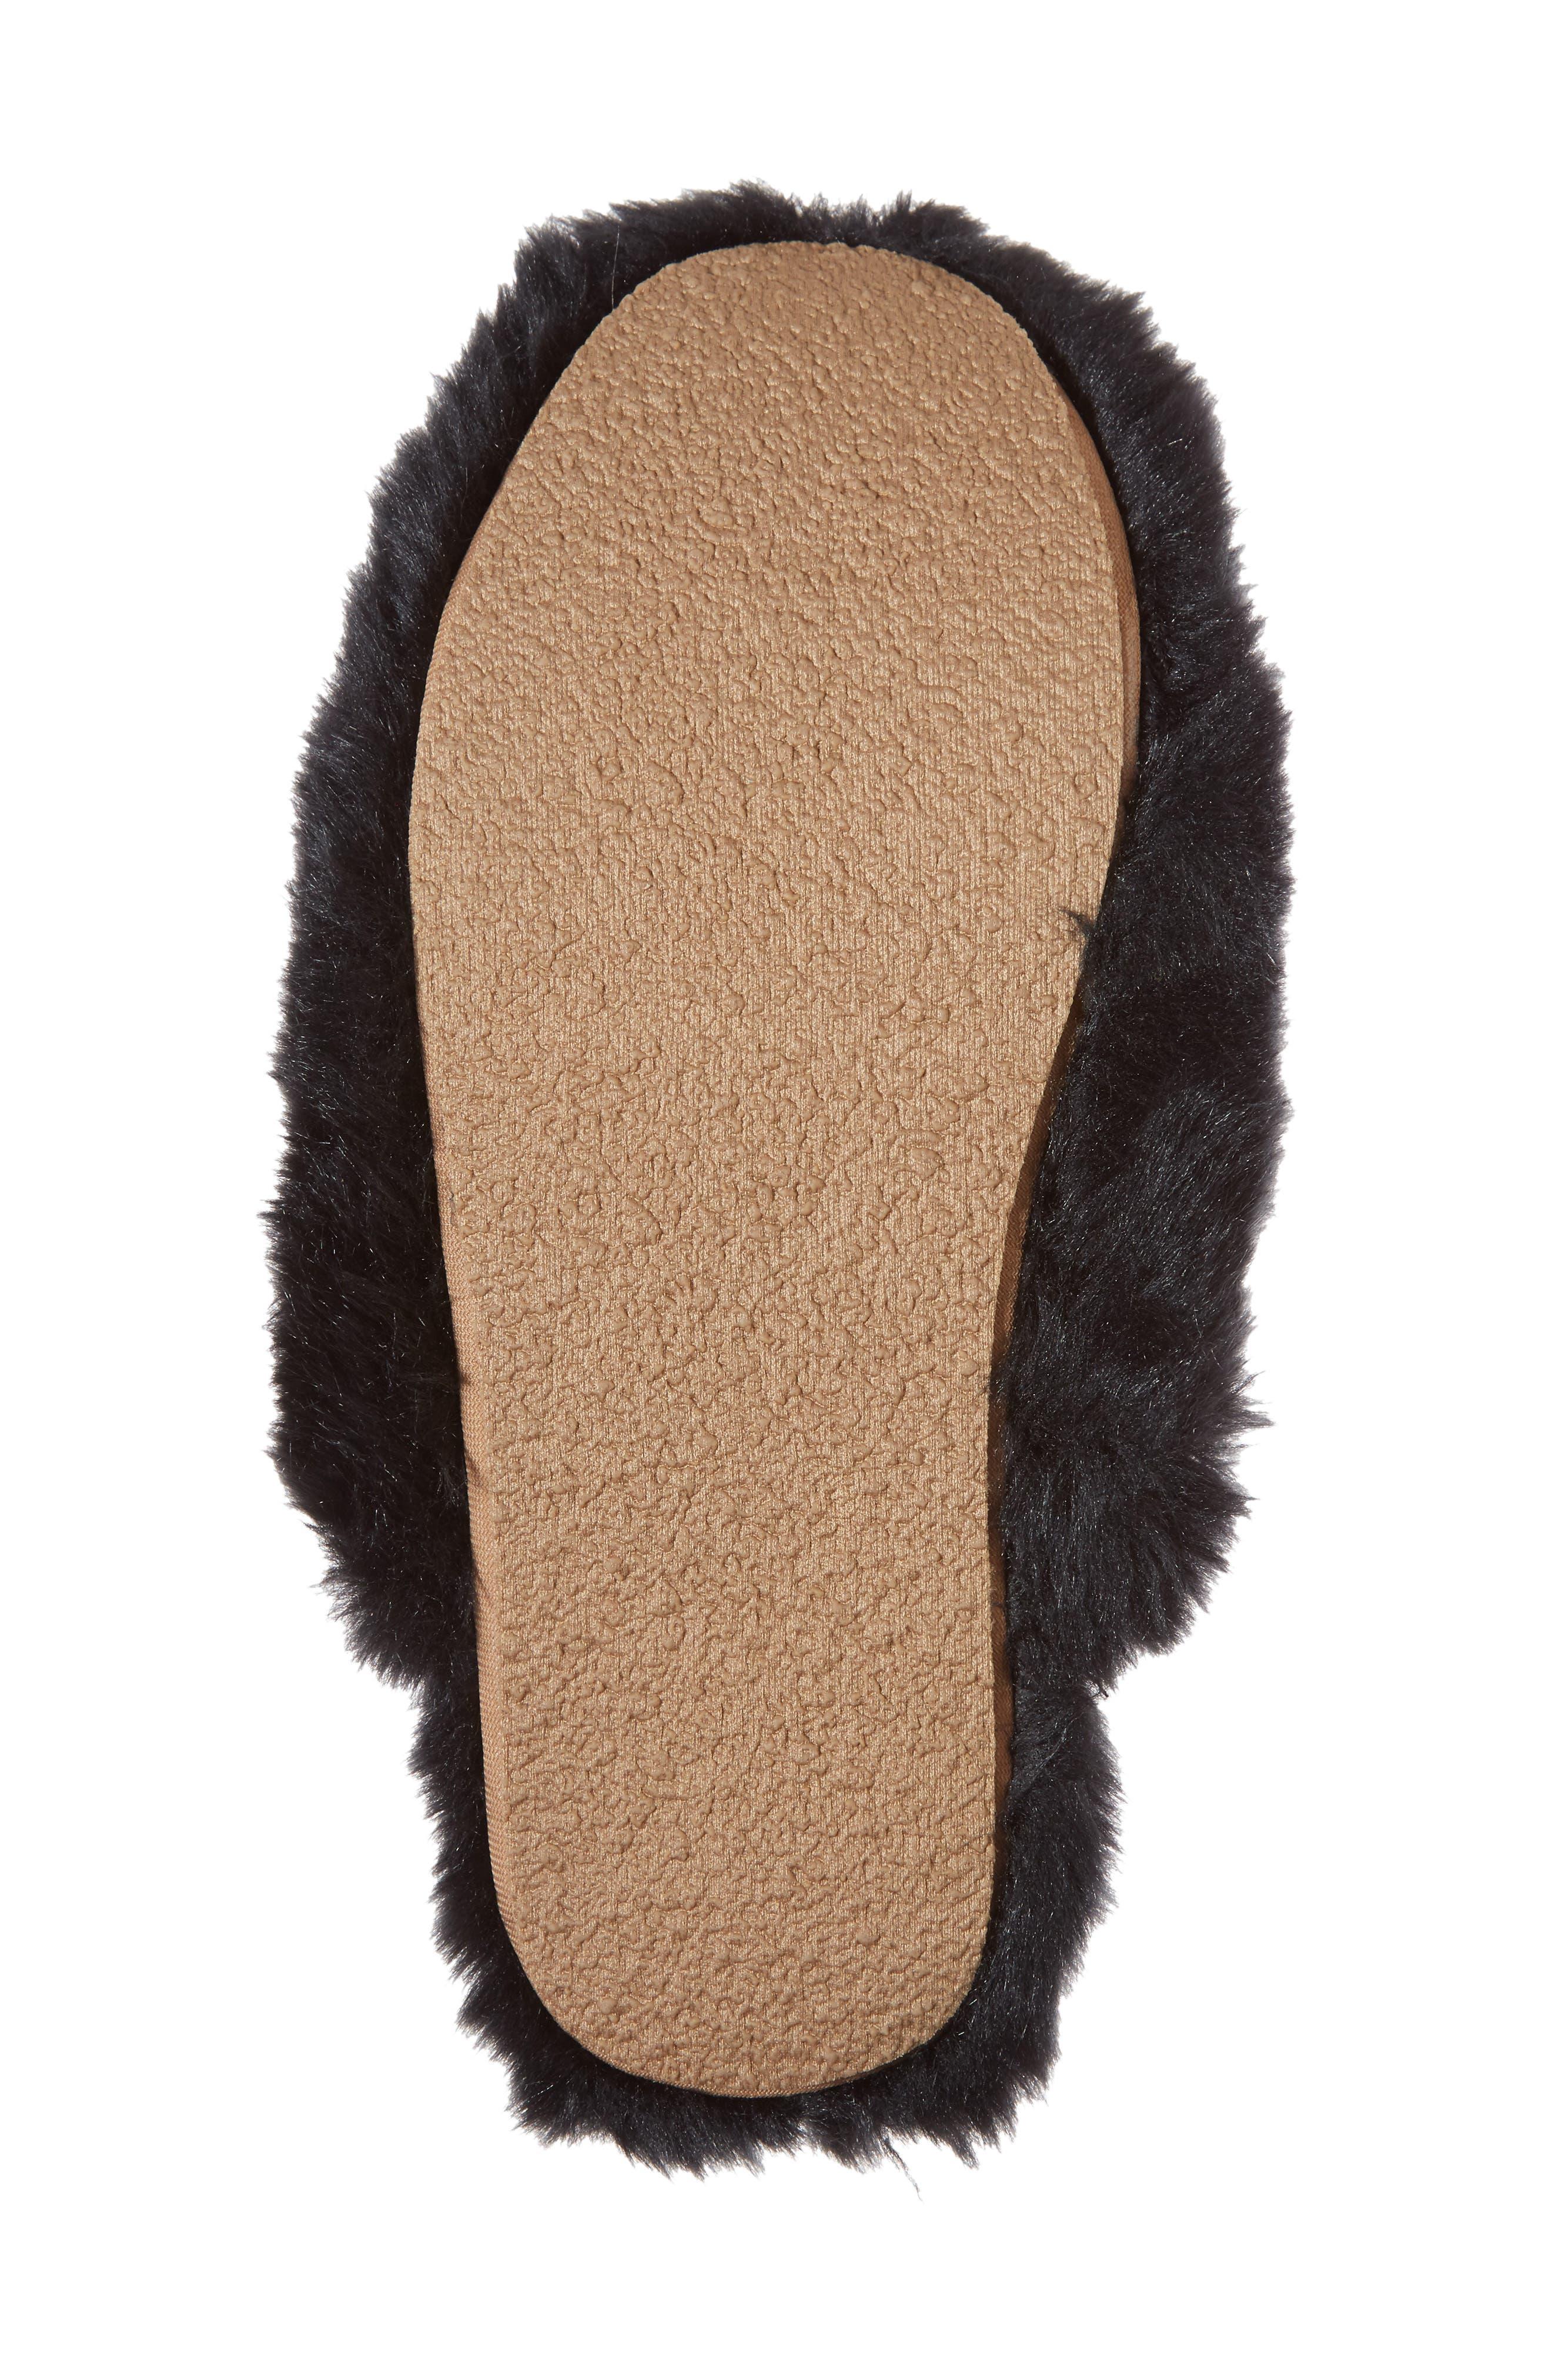 Faux Fur Slipper,                             Alternate thumbnail 6, color,                             BLACK